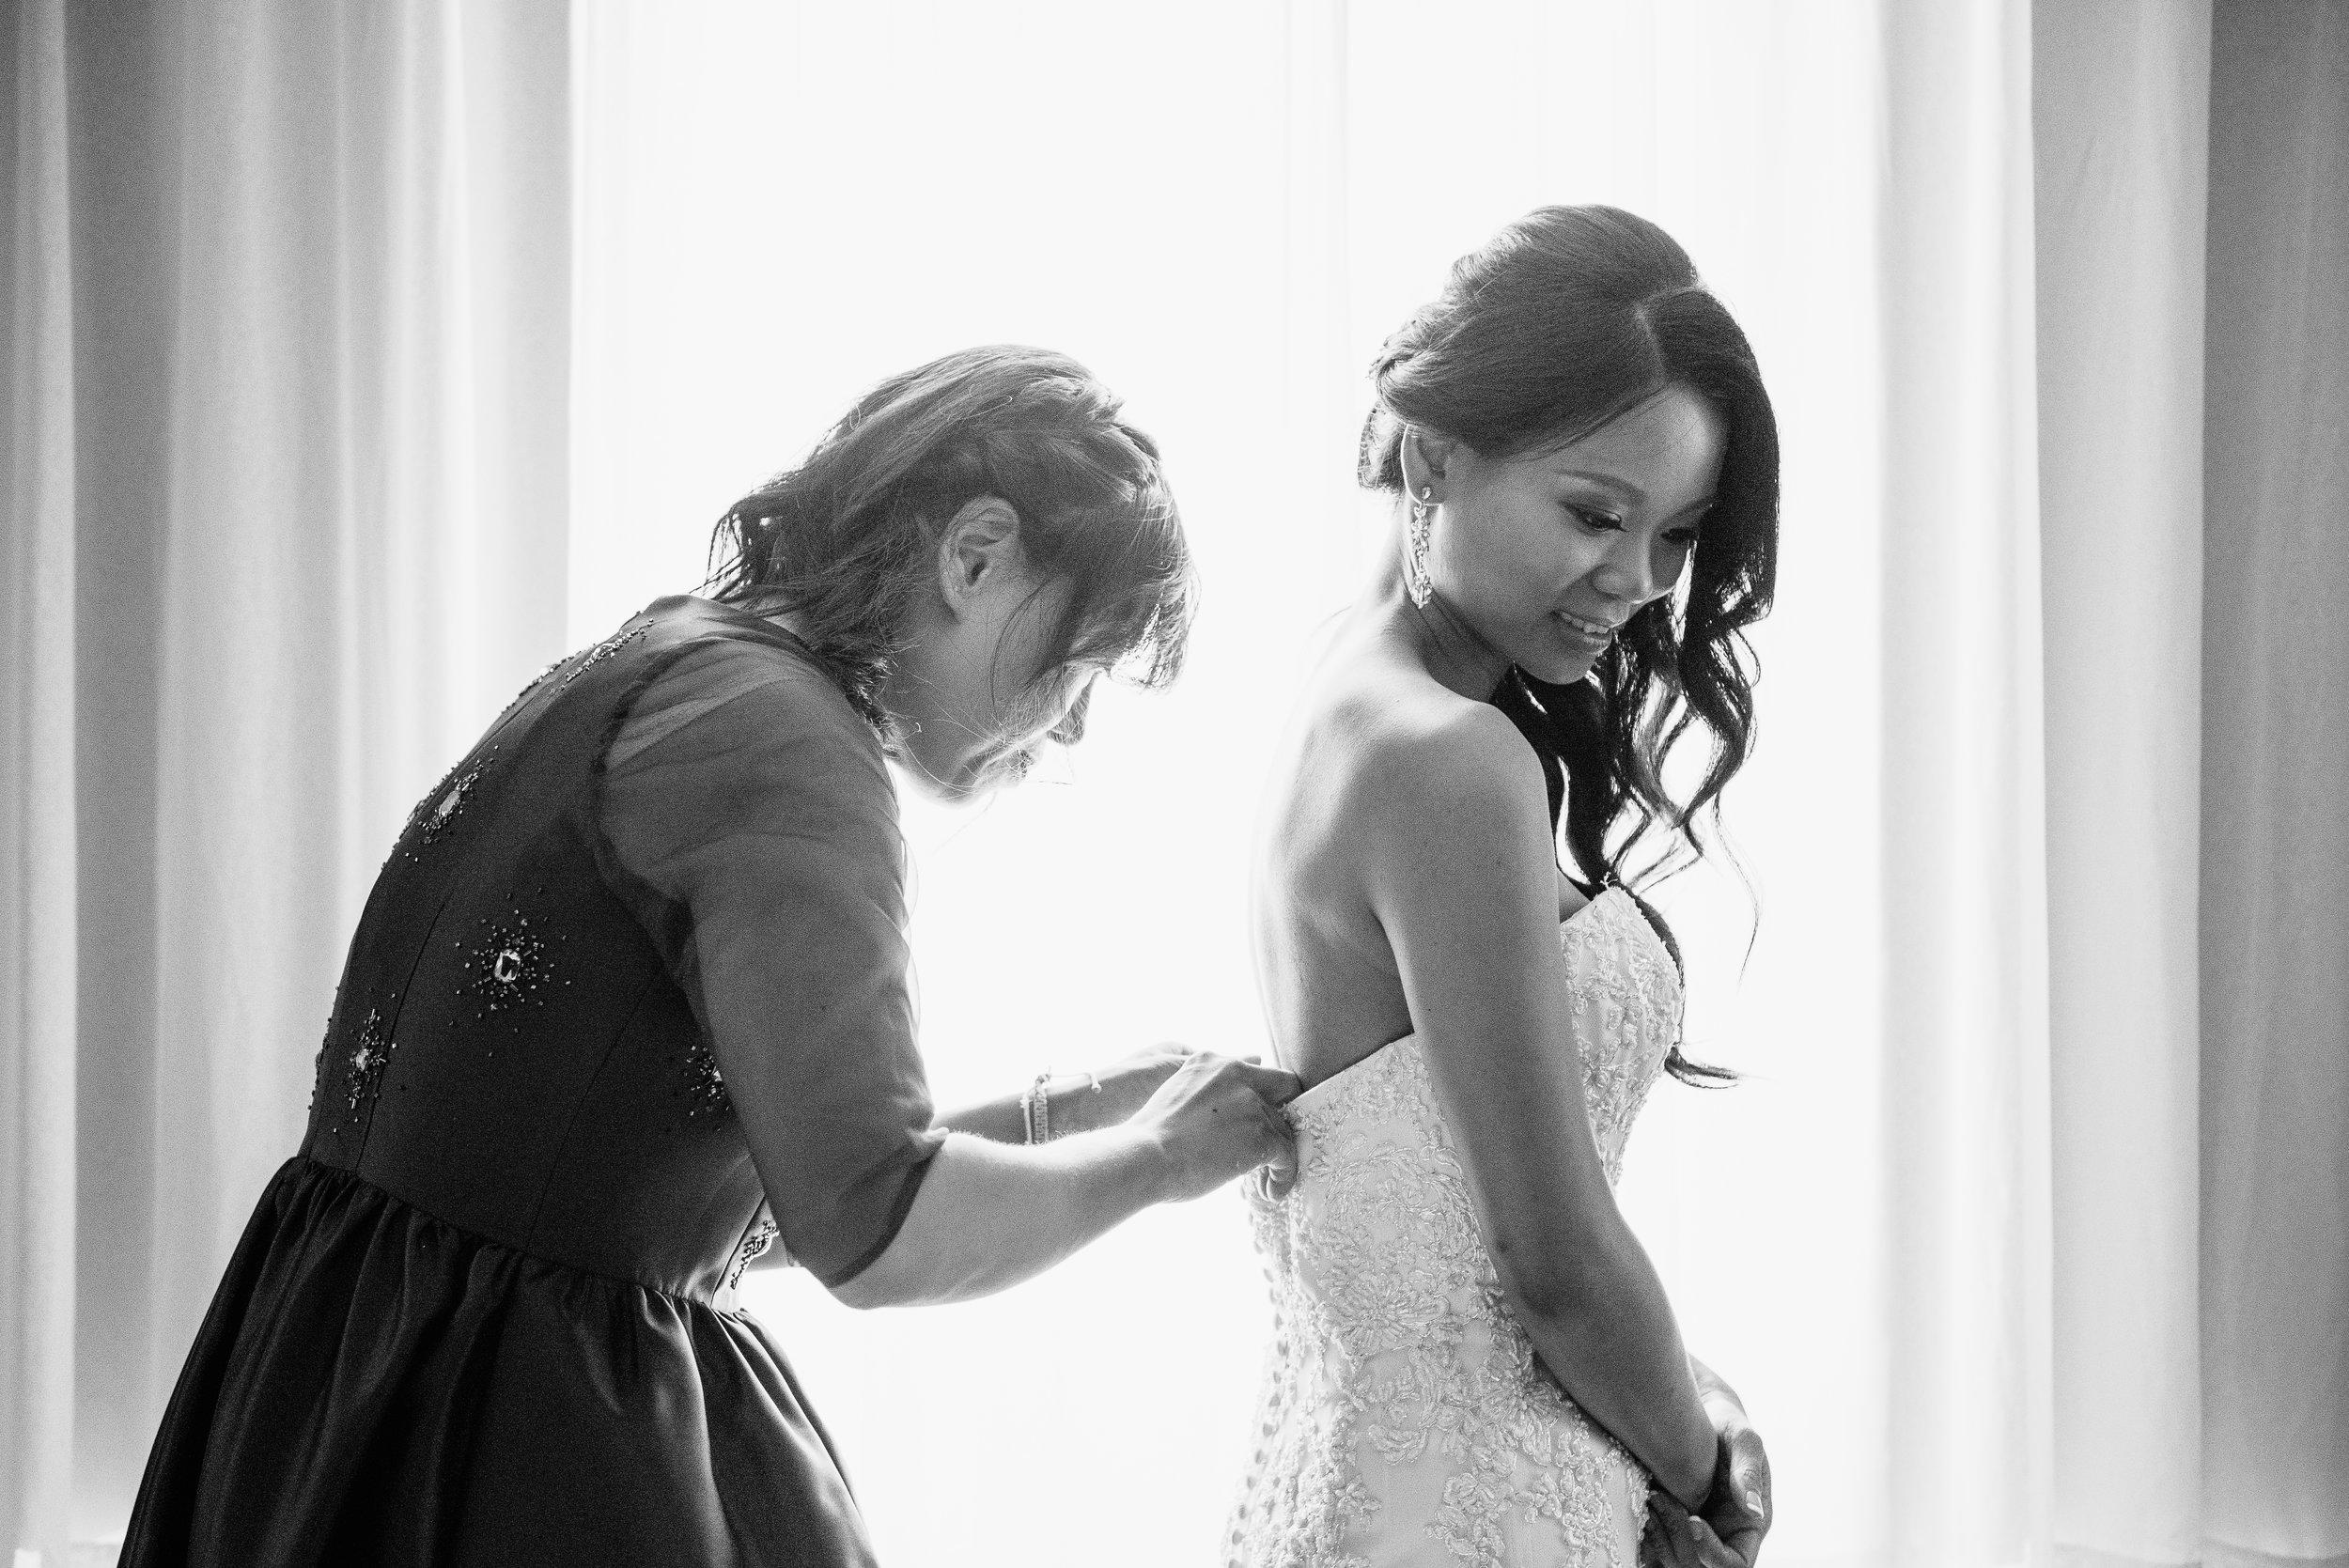 jennifer-jayn-photography-san-francisco-wedding-photographer-wedding-info-01.jpg